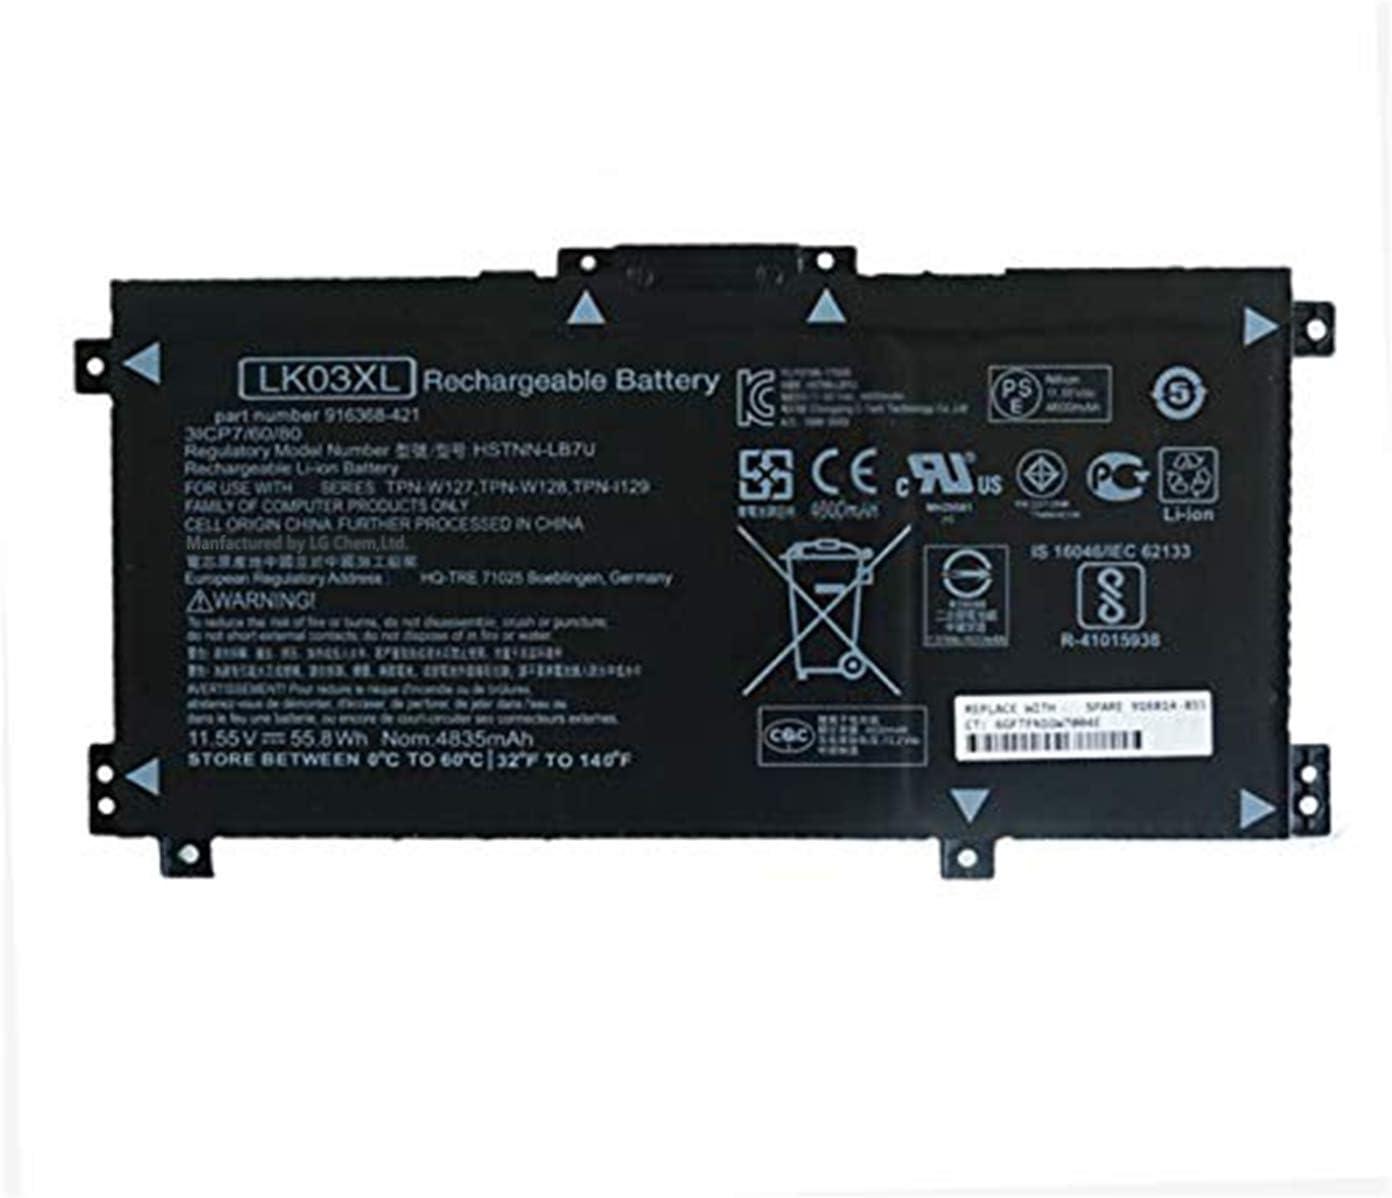 BOWEIRUI LK03XL HSTNN-UB71 916368-541 (11.55V 55.8Wh 4835mAh) Laptop Battery Replacement for Hp Envy 17 17-AE143NG 17M-AE0XX Envy X360 15-BP000 15-BP107TX 15M-BP000 15M-BP012DX Series 916814-855 91636